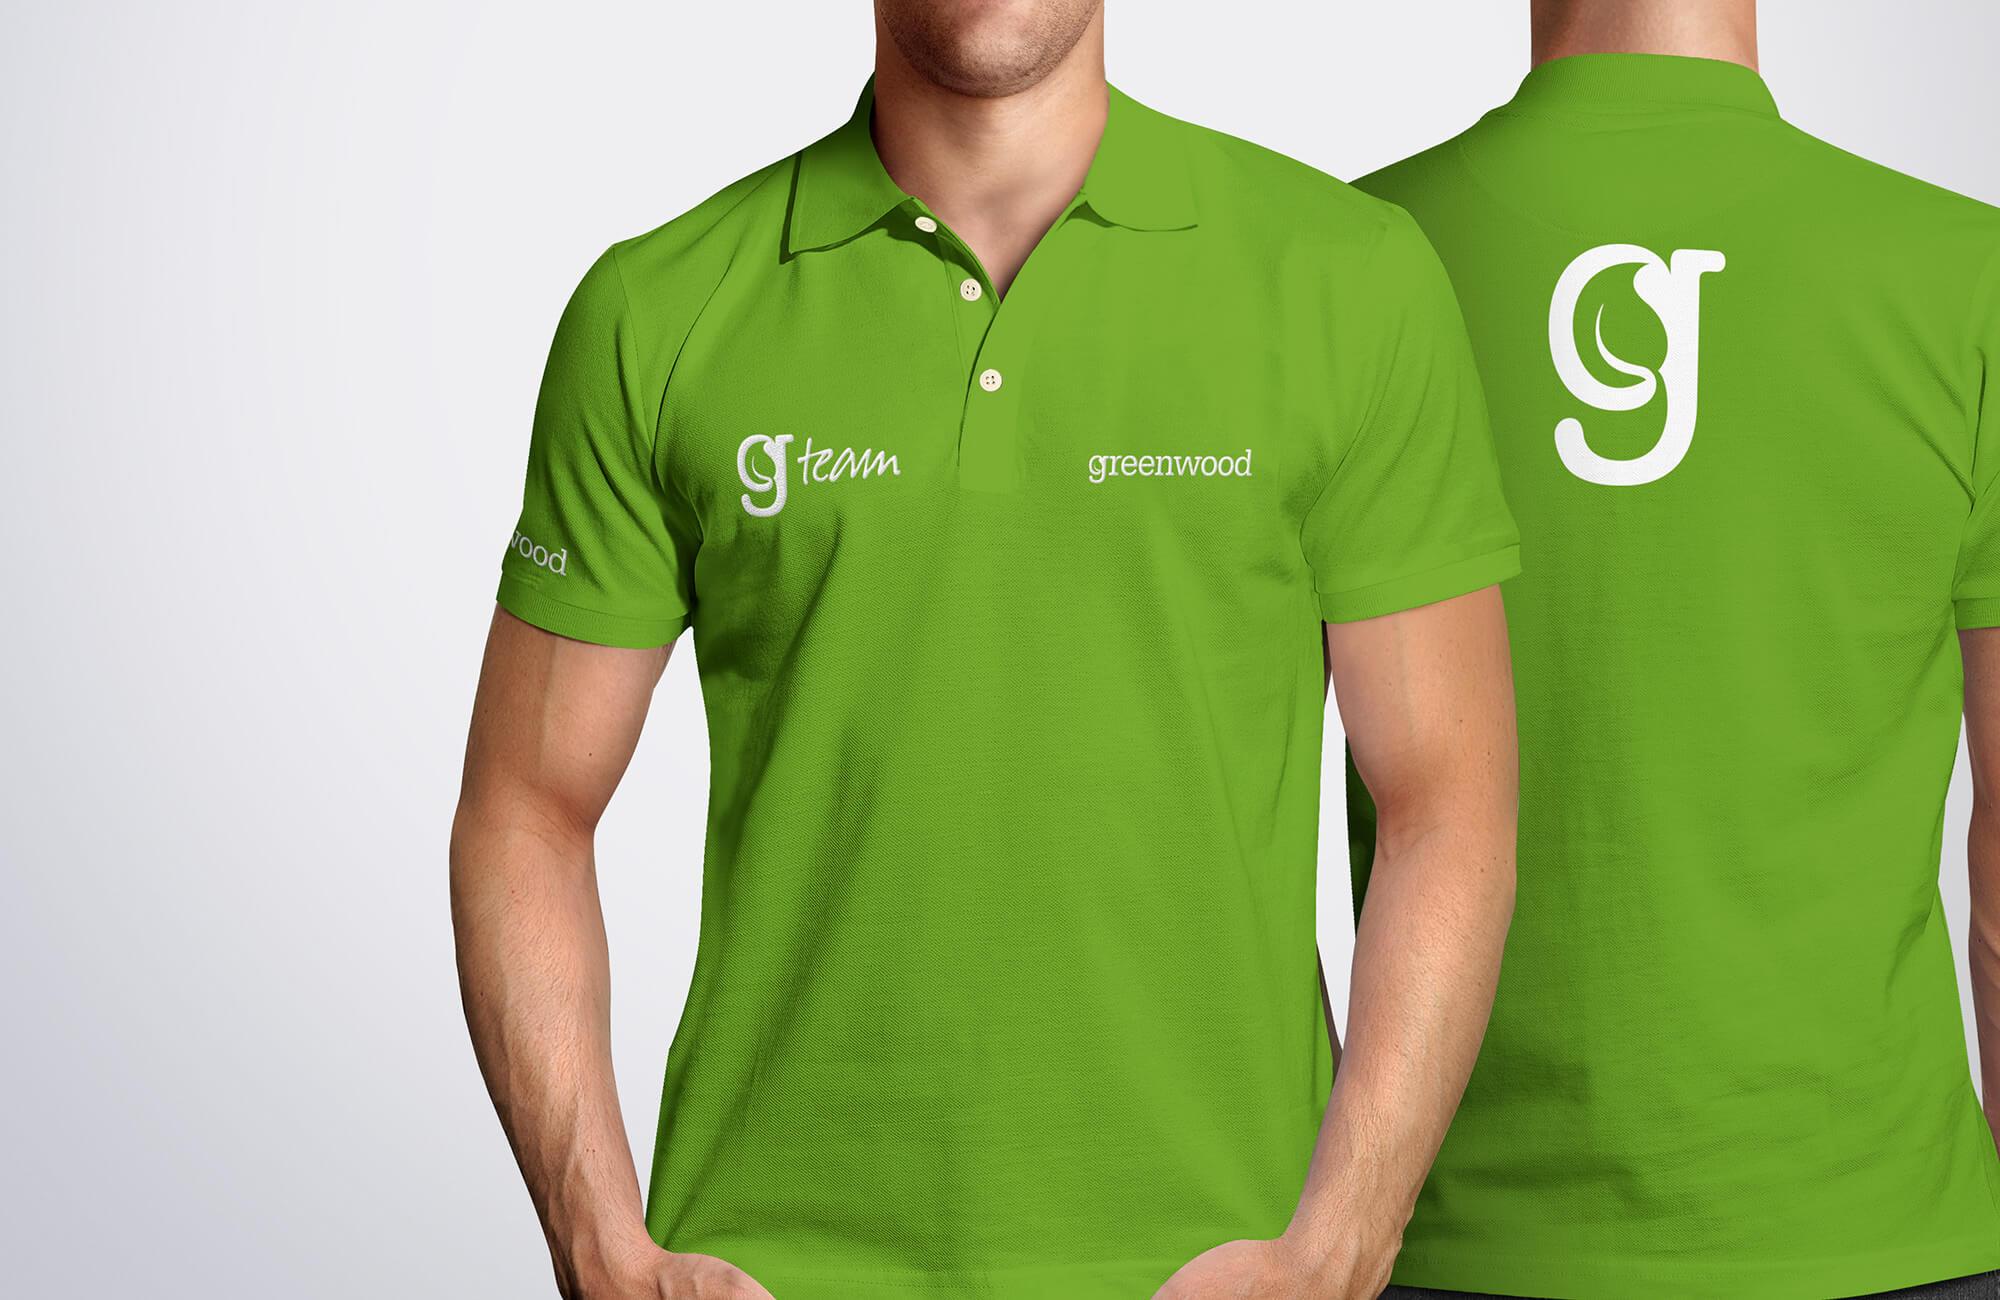 Greenwood Branded Polo Shirt Design Concept